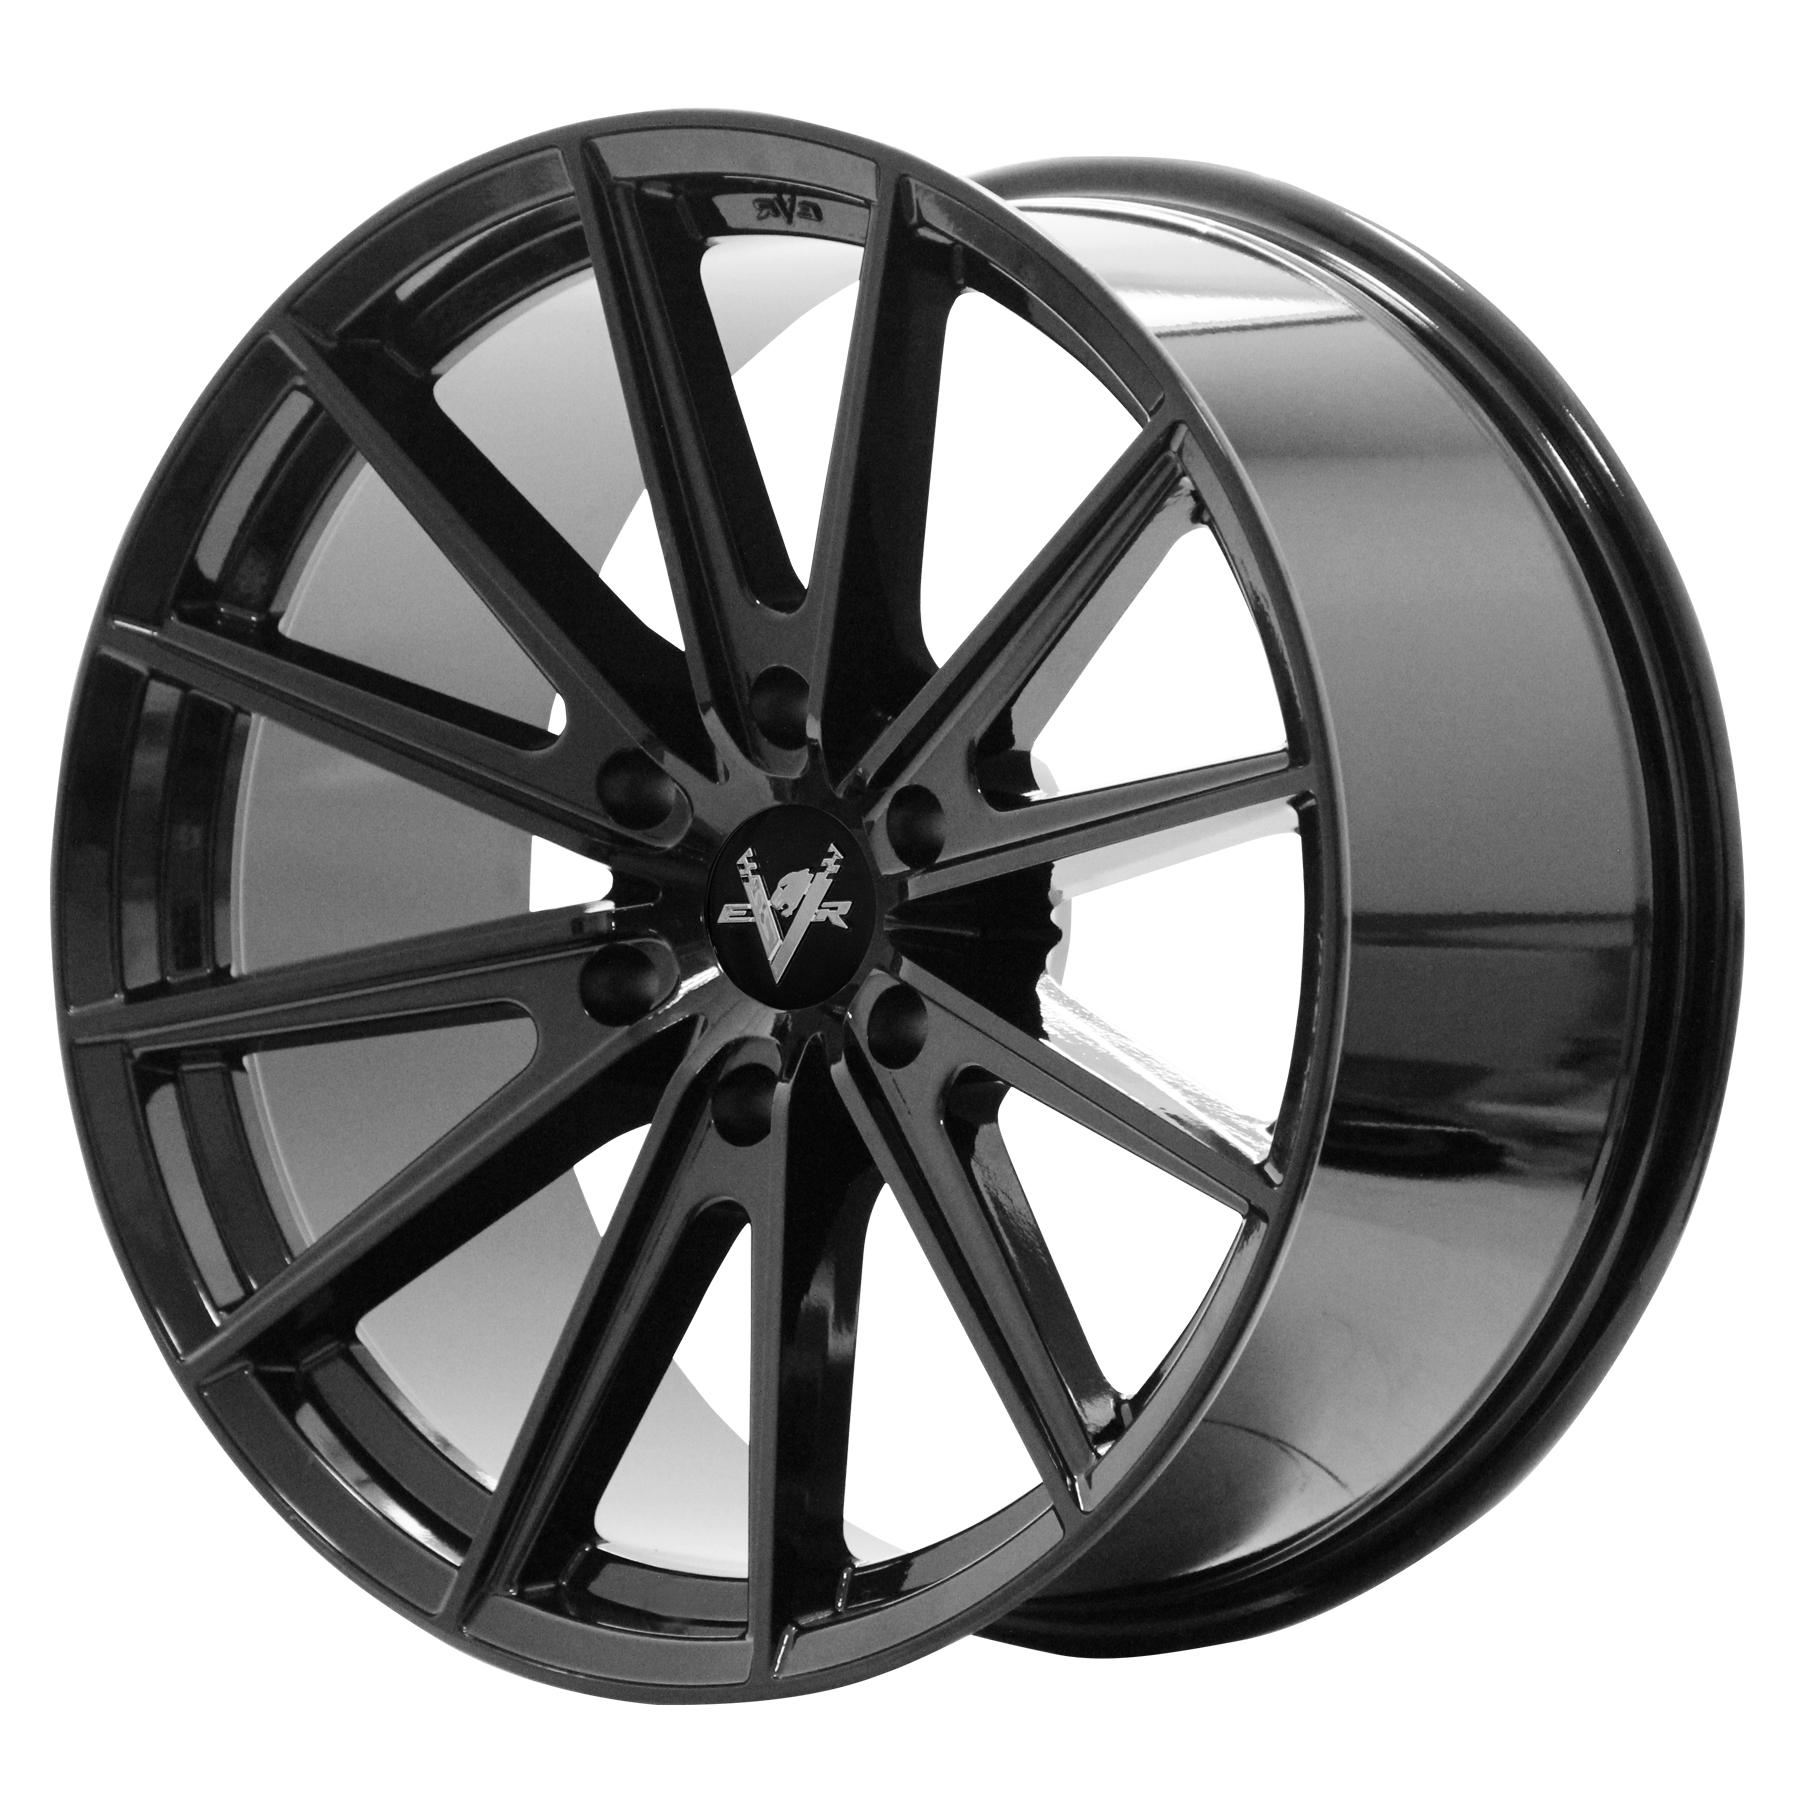 Intrepid – Ute / 4x4 Spec / SUV (Available November 2018)  Size: 20 x 9.5  Colour: Gloss black